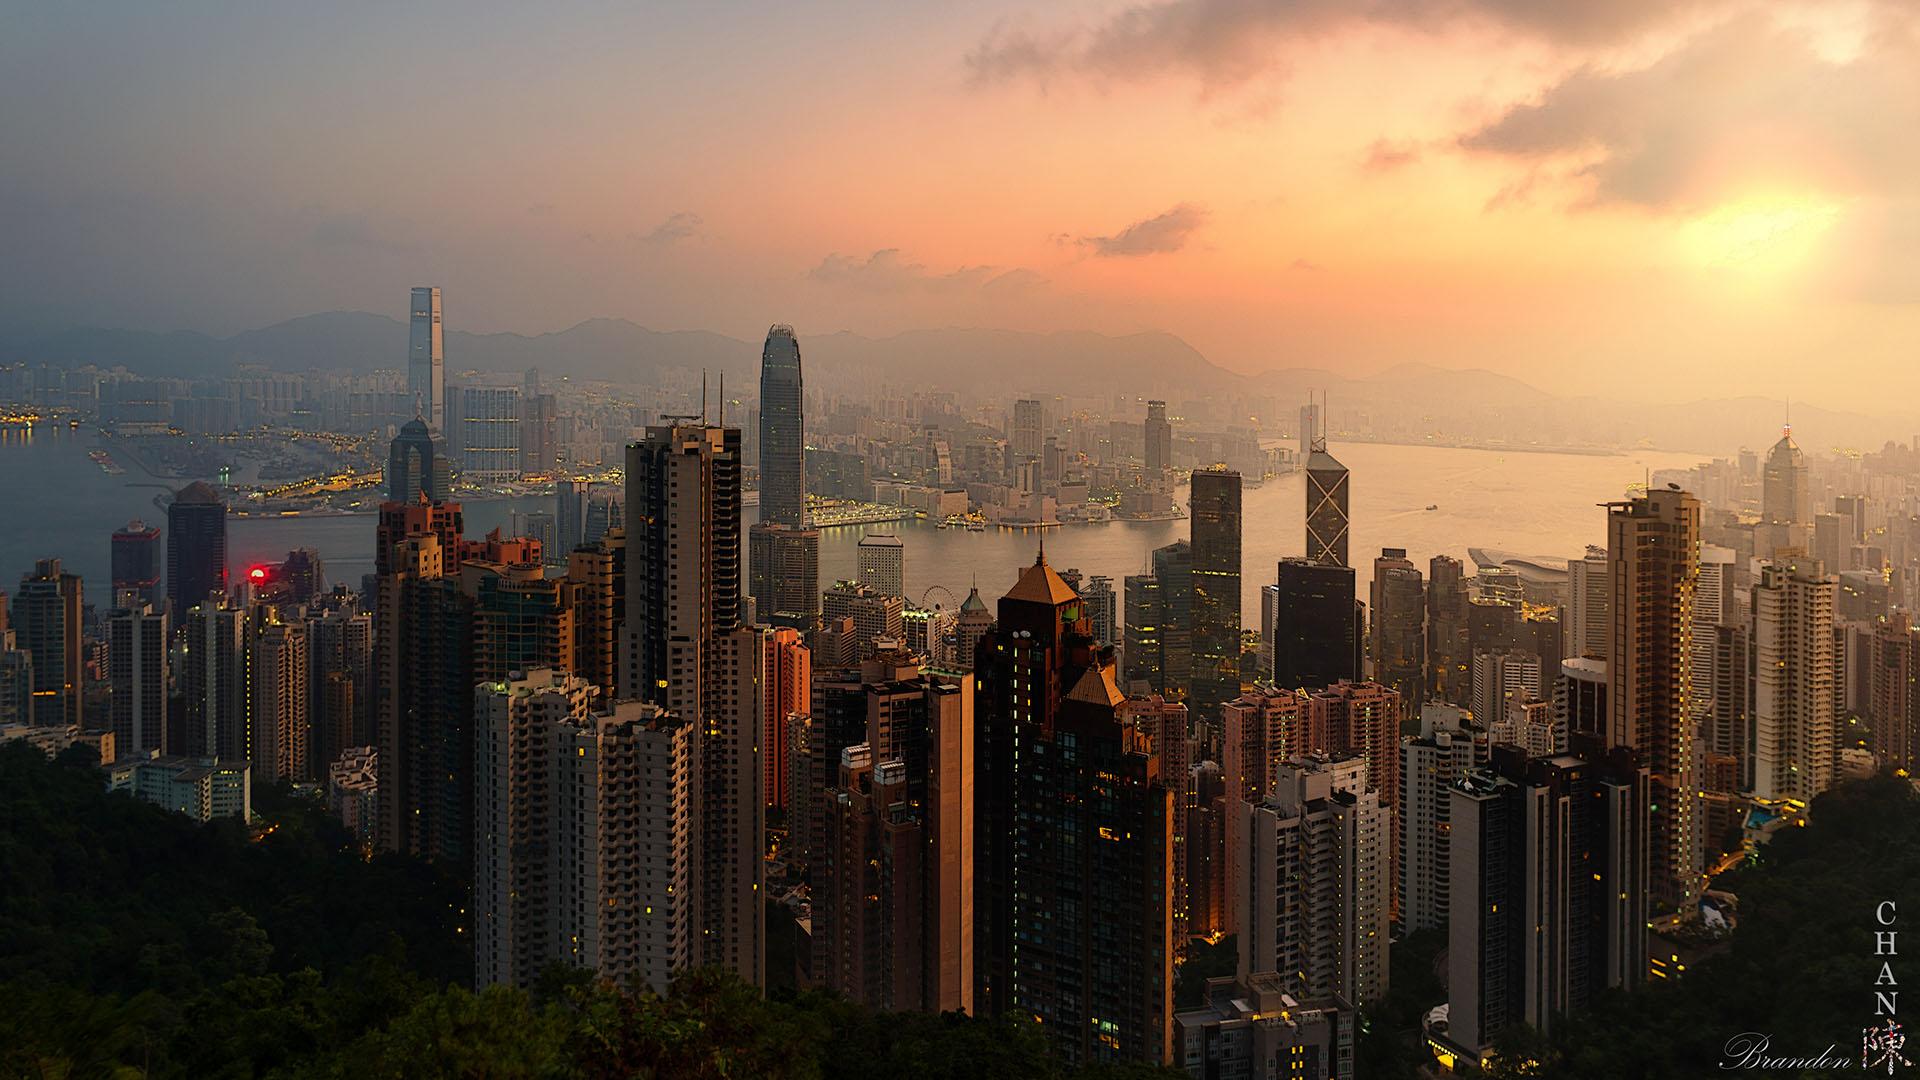 The Victoria Peak - Hong Kong Island - Sunset, Hong Kong